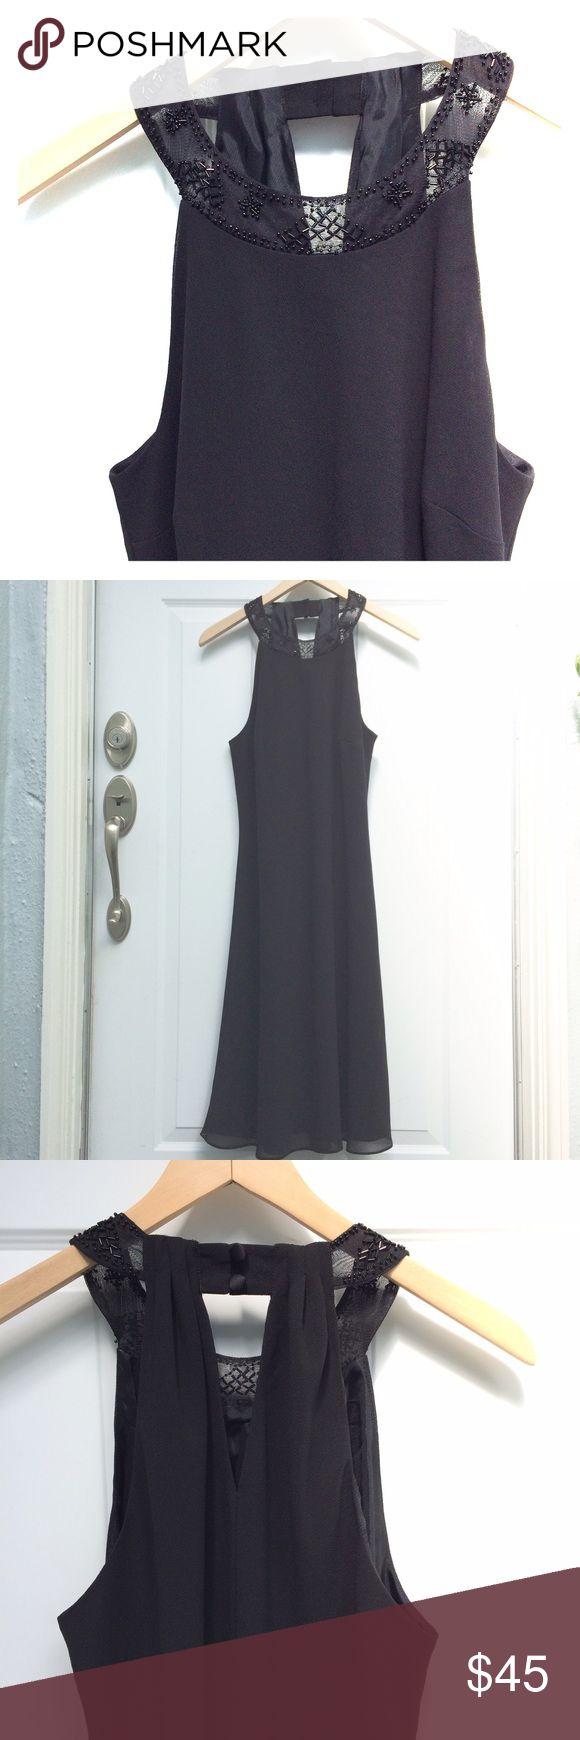 Donna Morgan beaded neckline dress Beautiful beaded neckline black dress by Donna Morgan. Excellent used condition. Donna Morgan Dresses